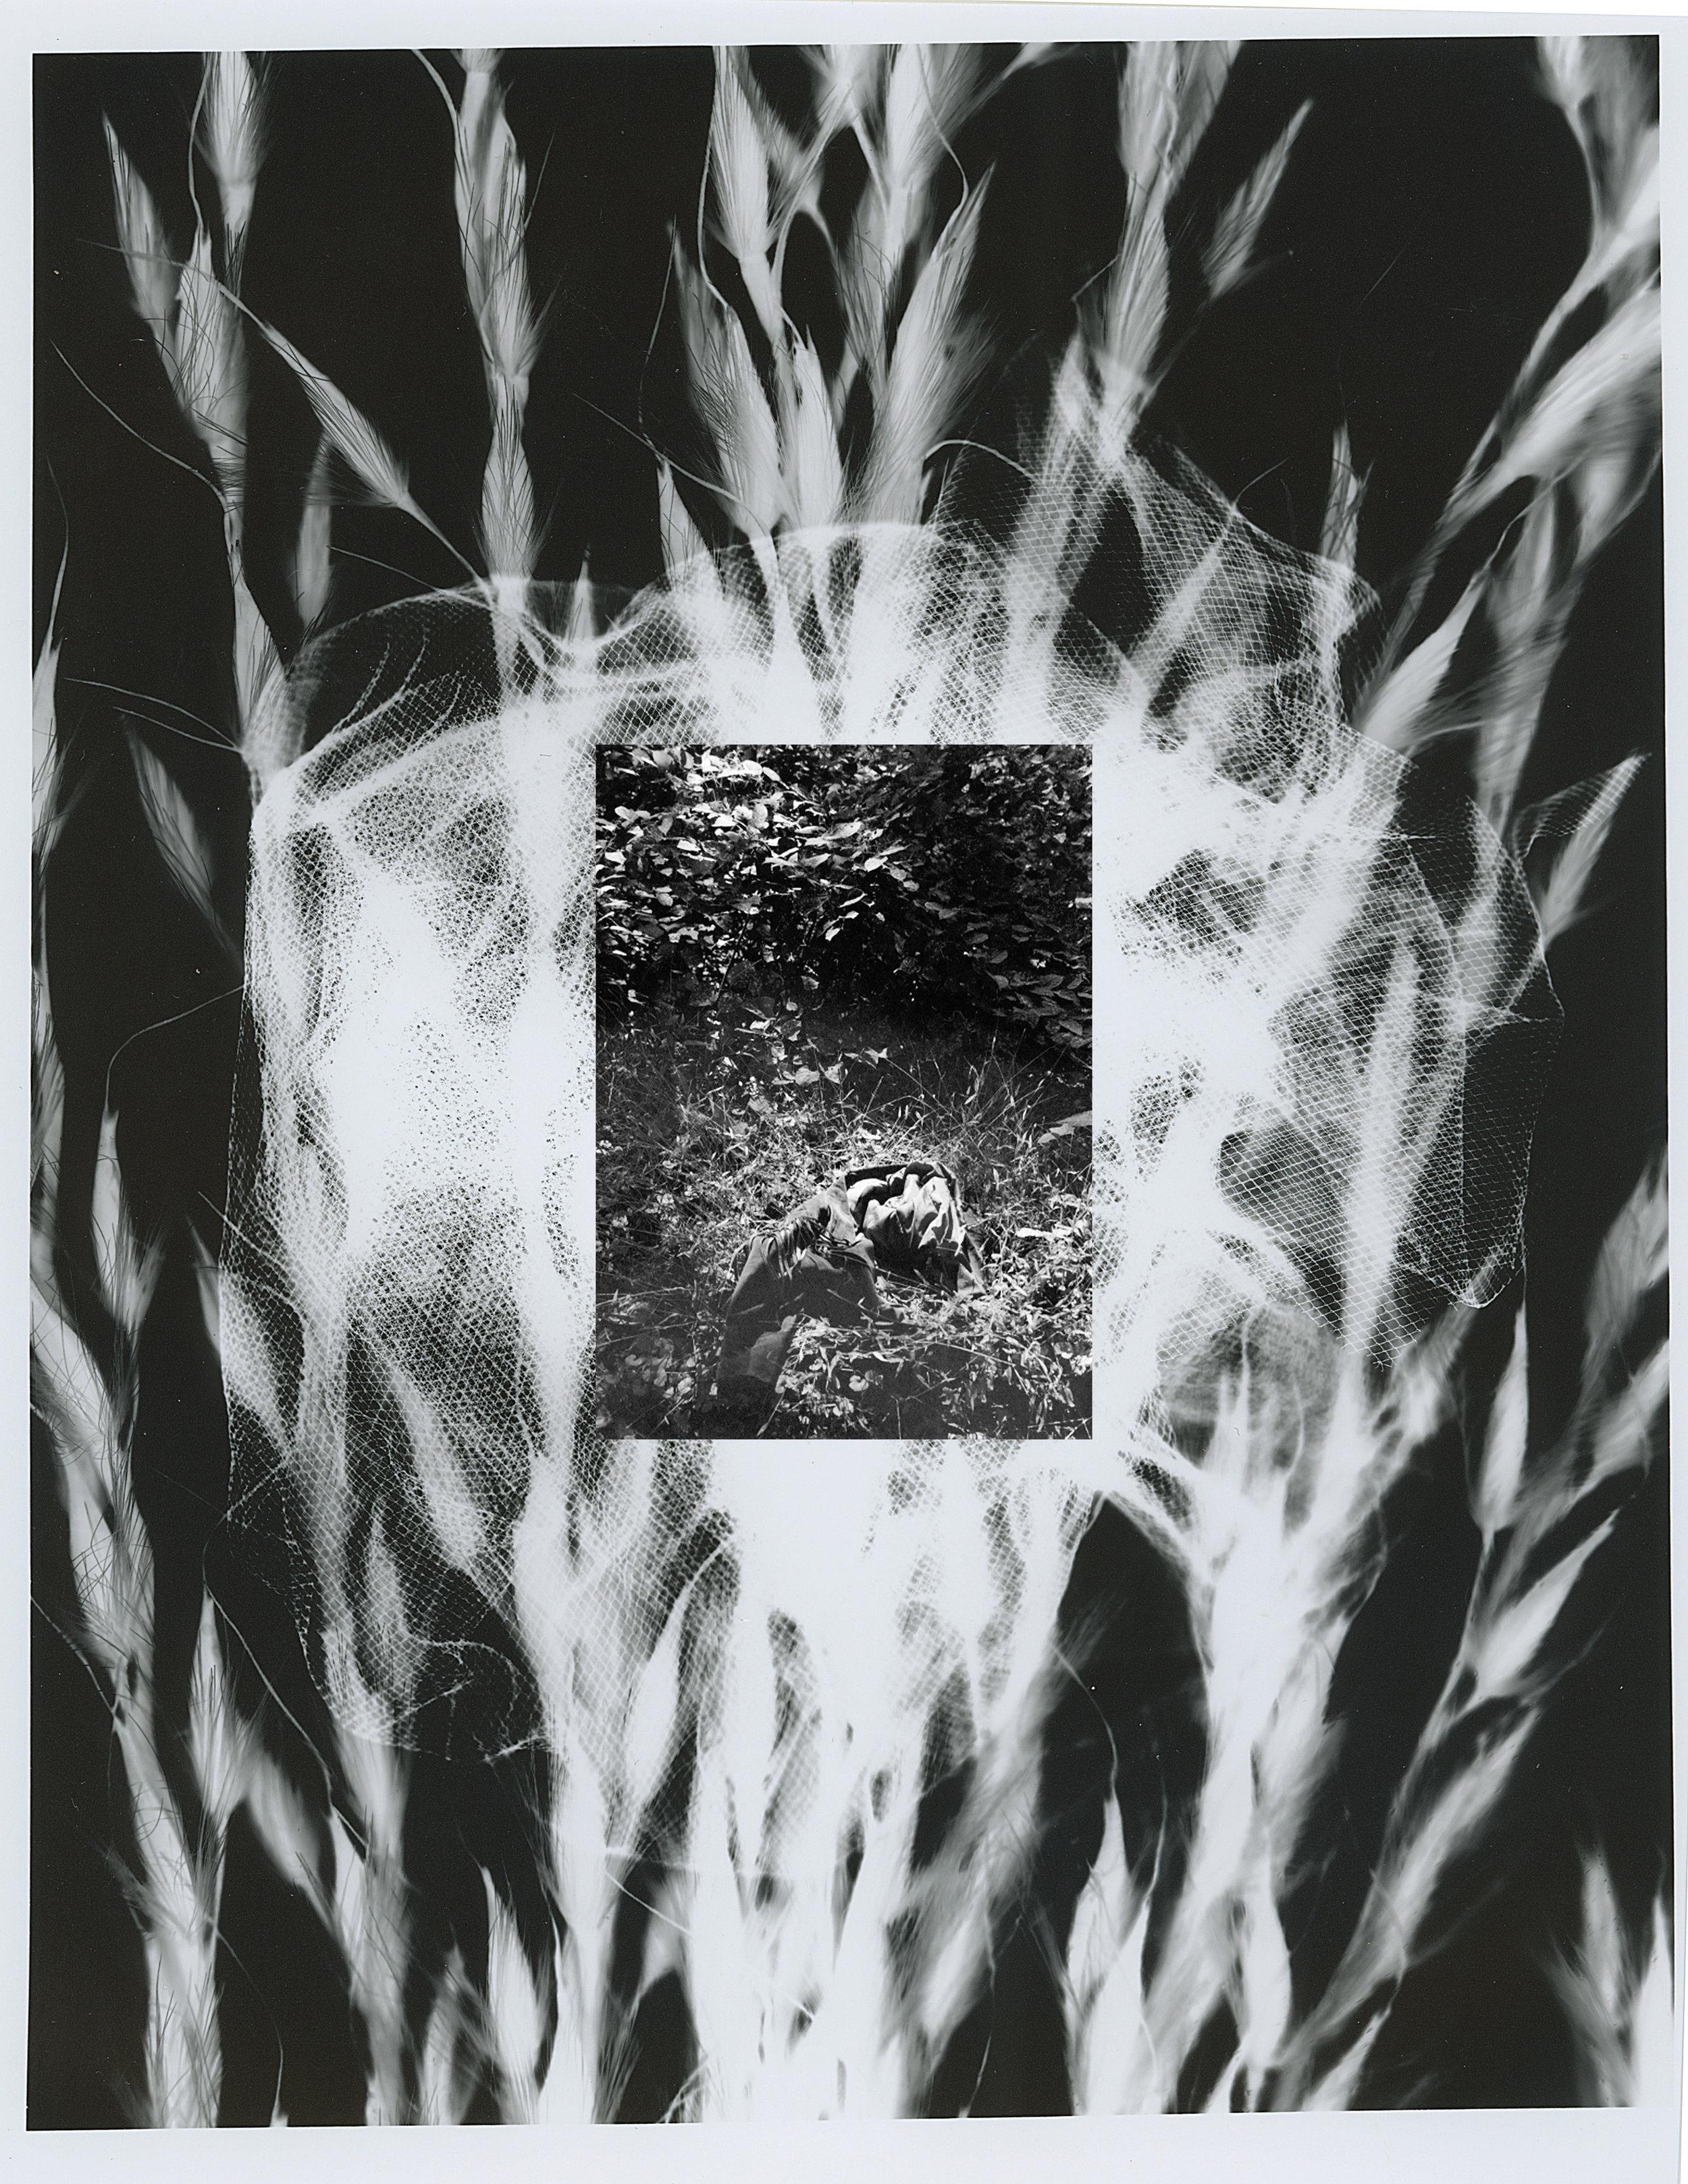 Silver Gelatin Print, 2018.  (8 x 11 in)